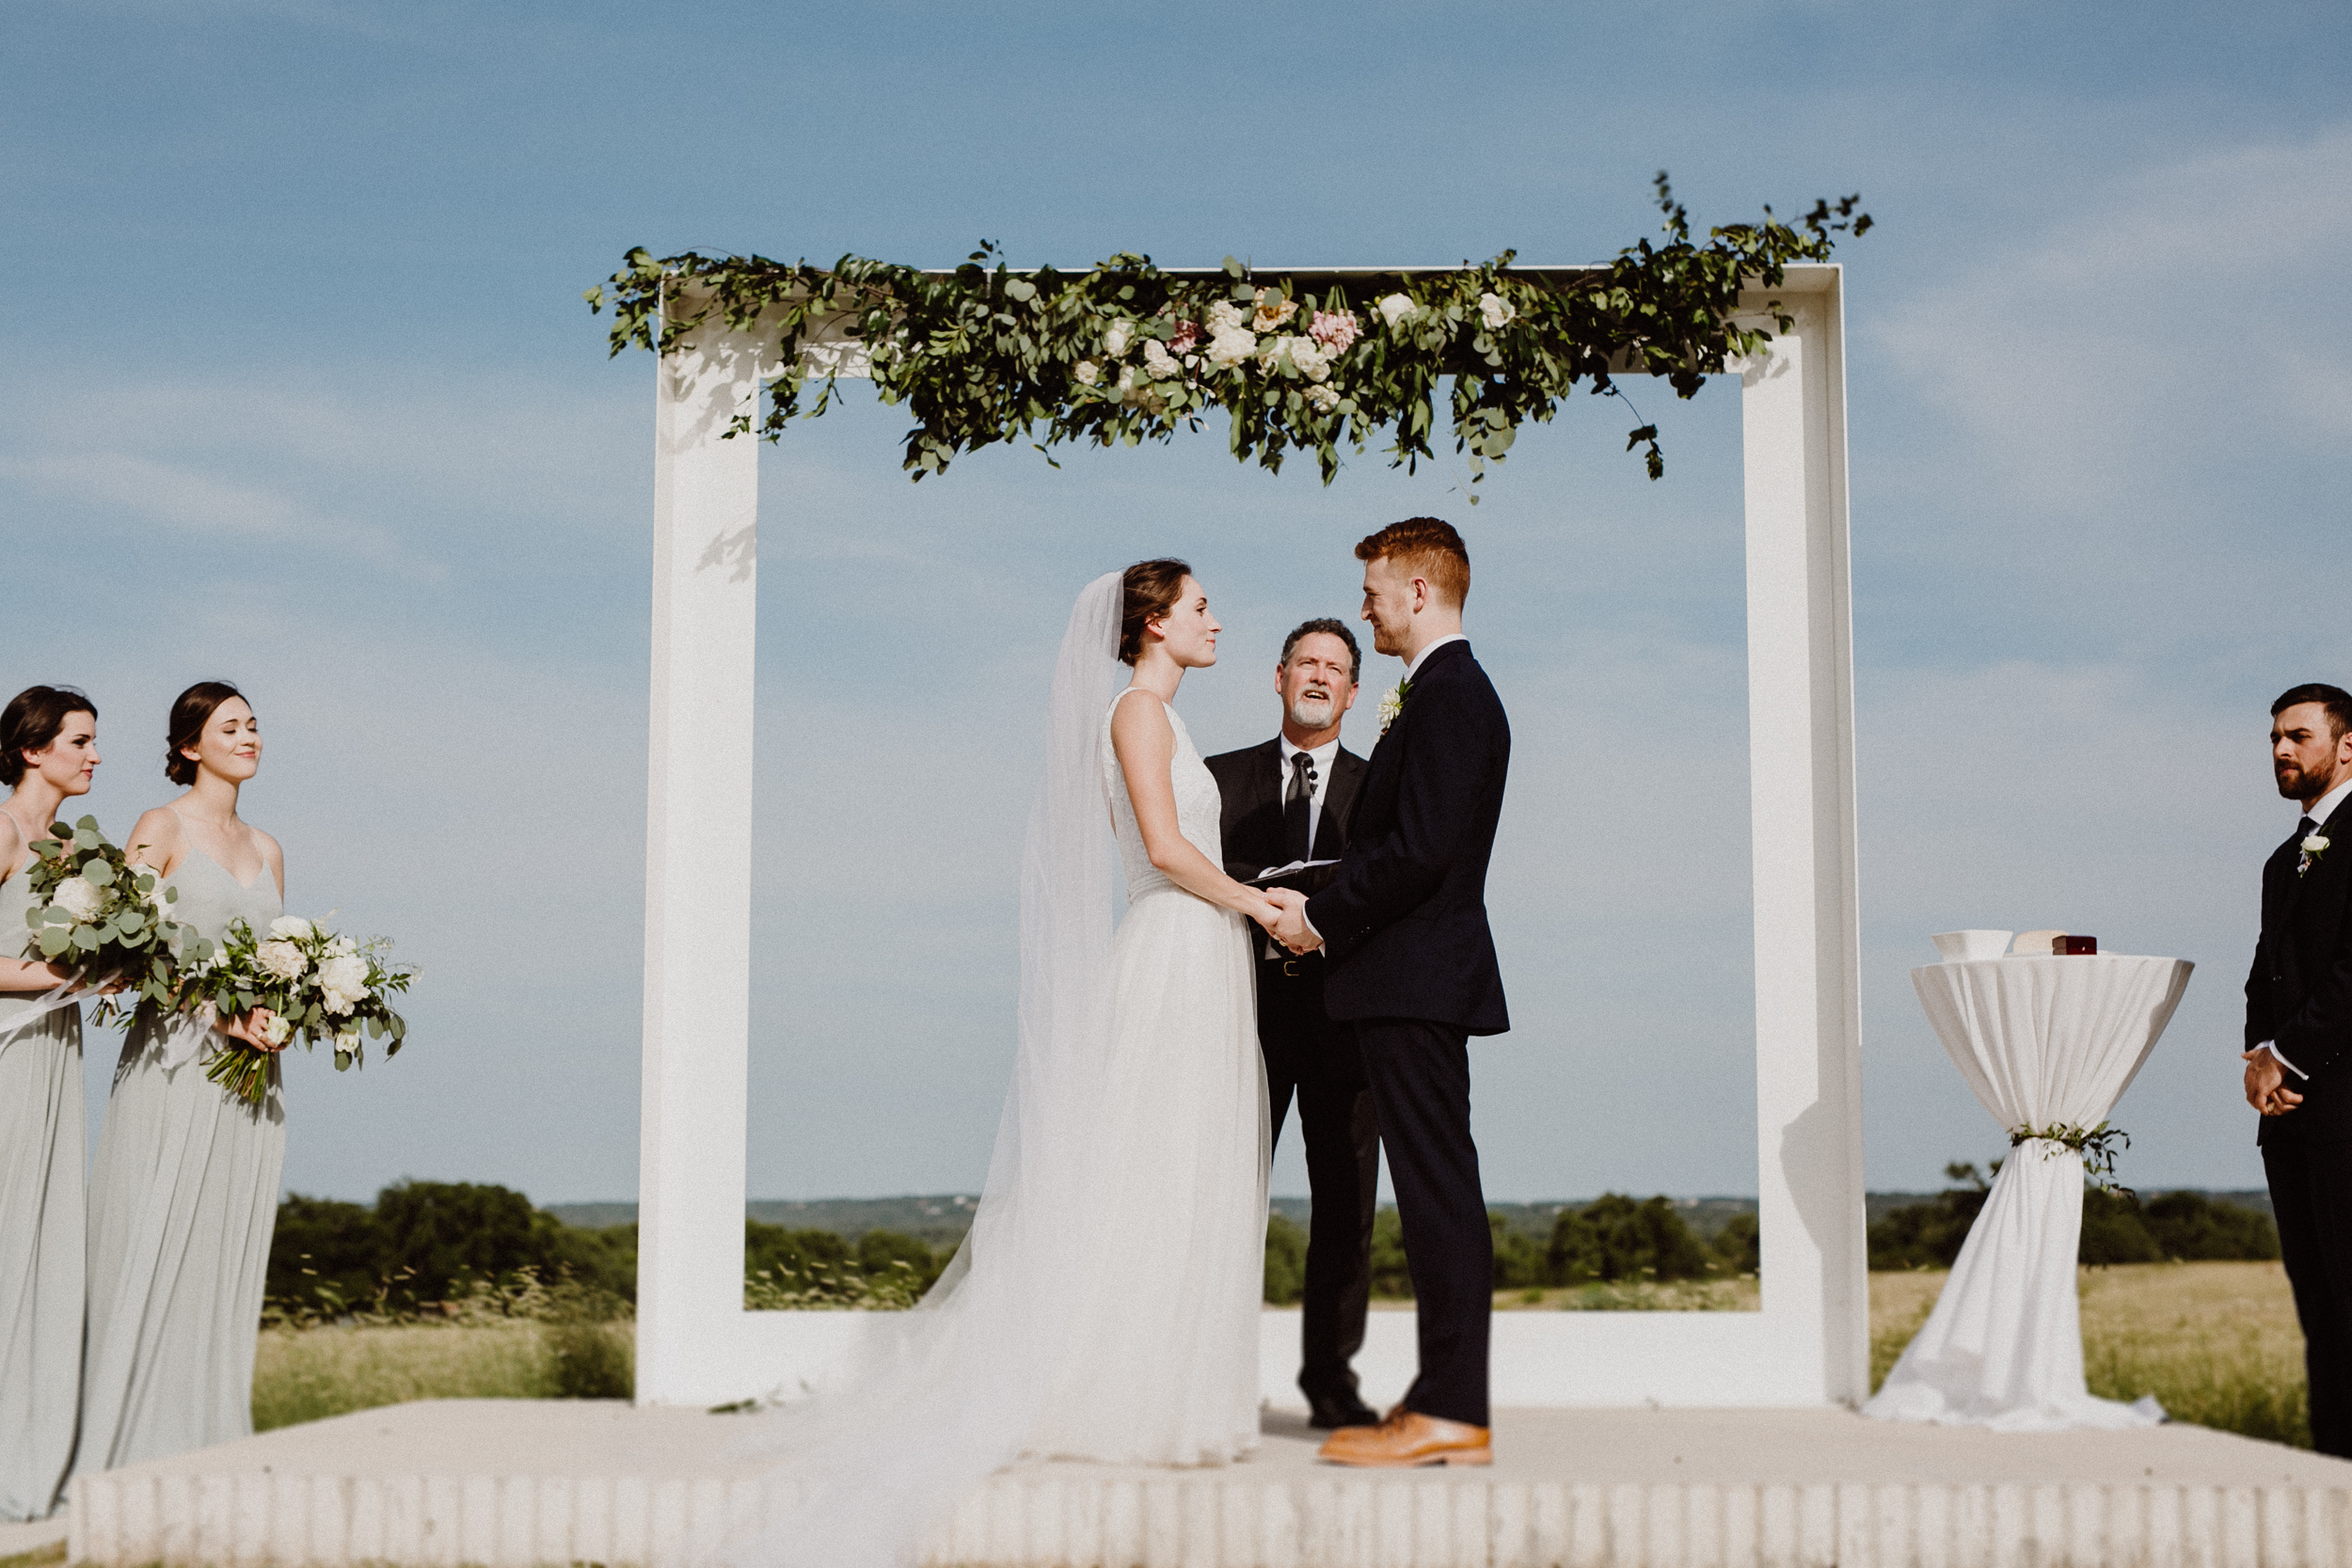 prospect-house-wedding-S&AC-605.jpg